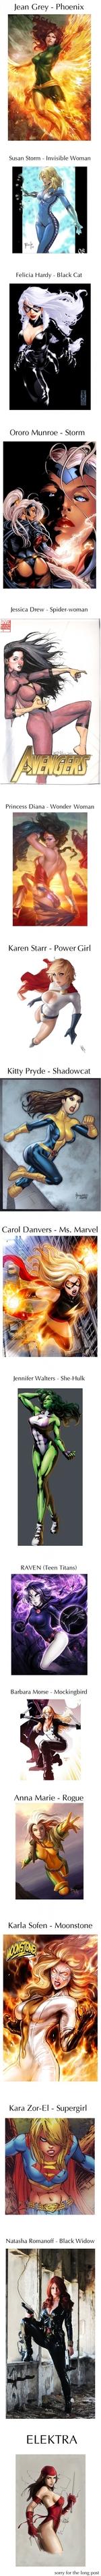 Ororo Munroe - Storm Jessica Drew - Spider-woman Karen Starr - Power Girl Kitty Pryde - Shadowcat Carol Danvers - Ms. Marvel Anna Marie - Rogue Karla Sofen - Moonstone Kara Zor-EI - Supergirl ELEKTRA